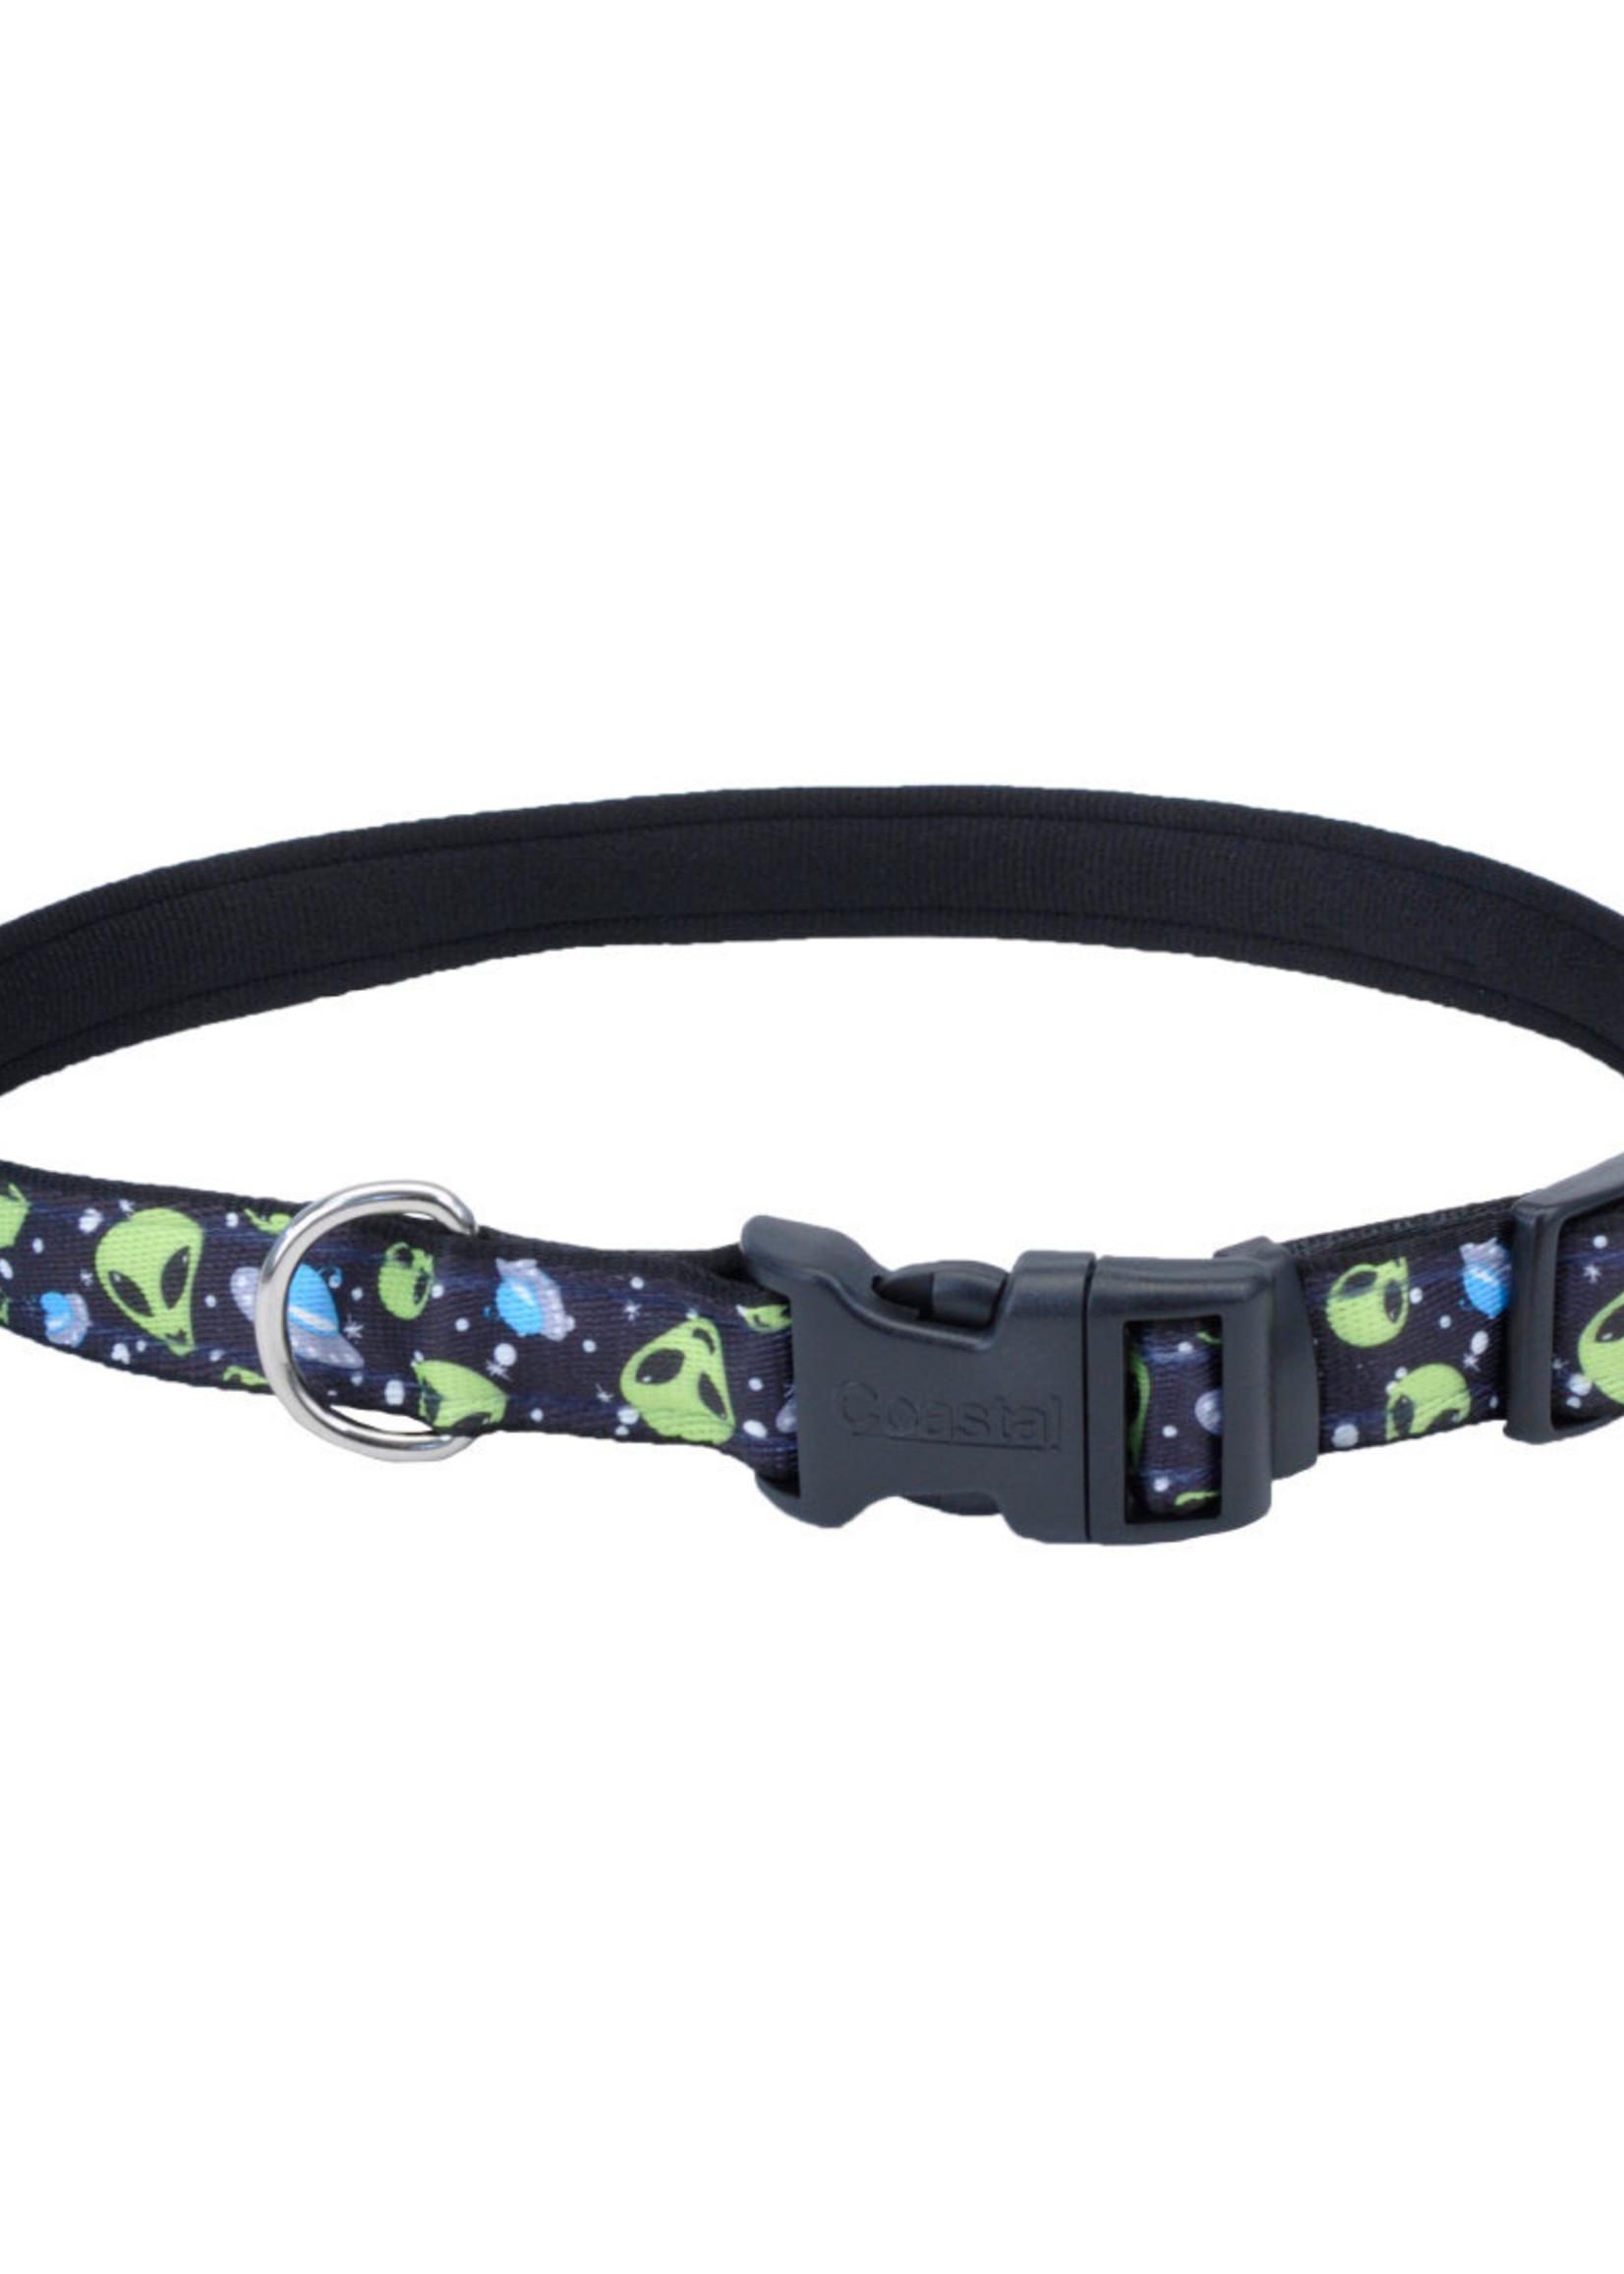 "Coastal® Pet Attire Aliens Collar 5/8"" x10-14"""